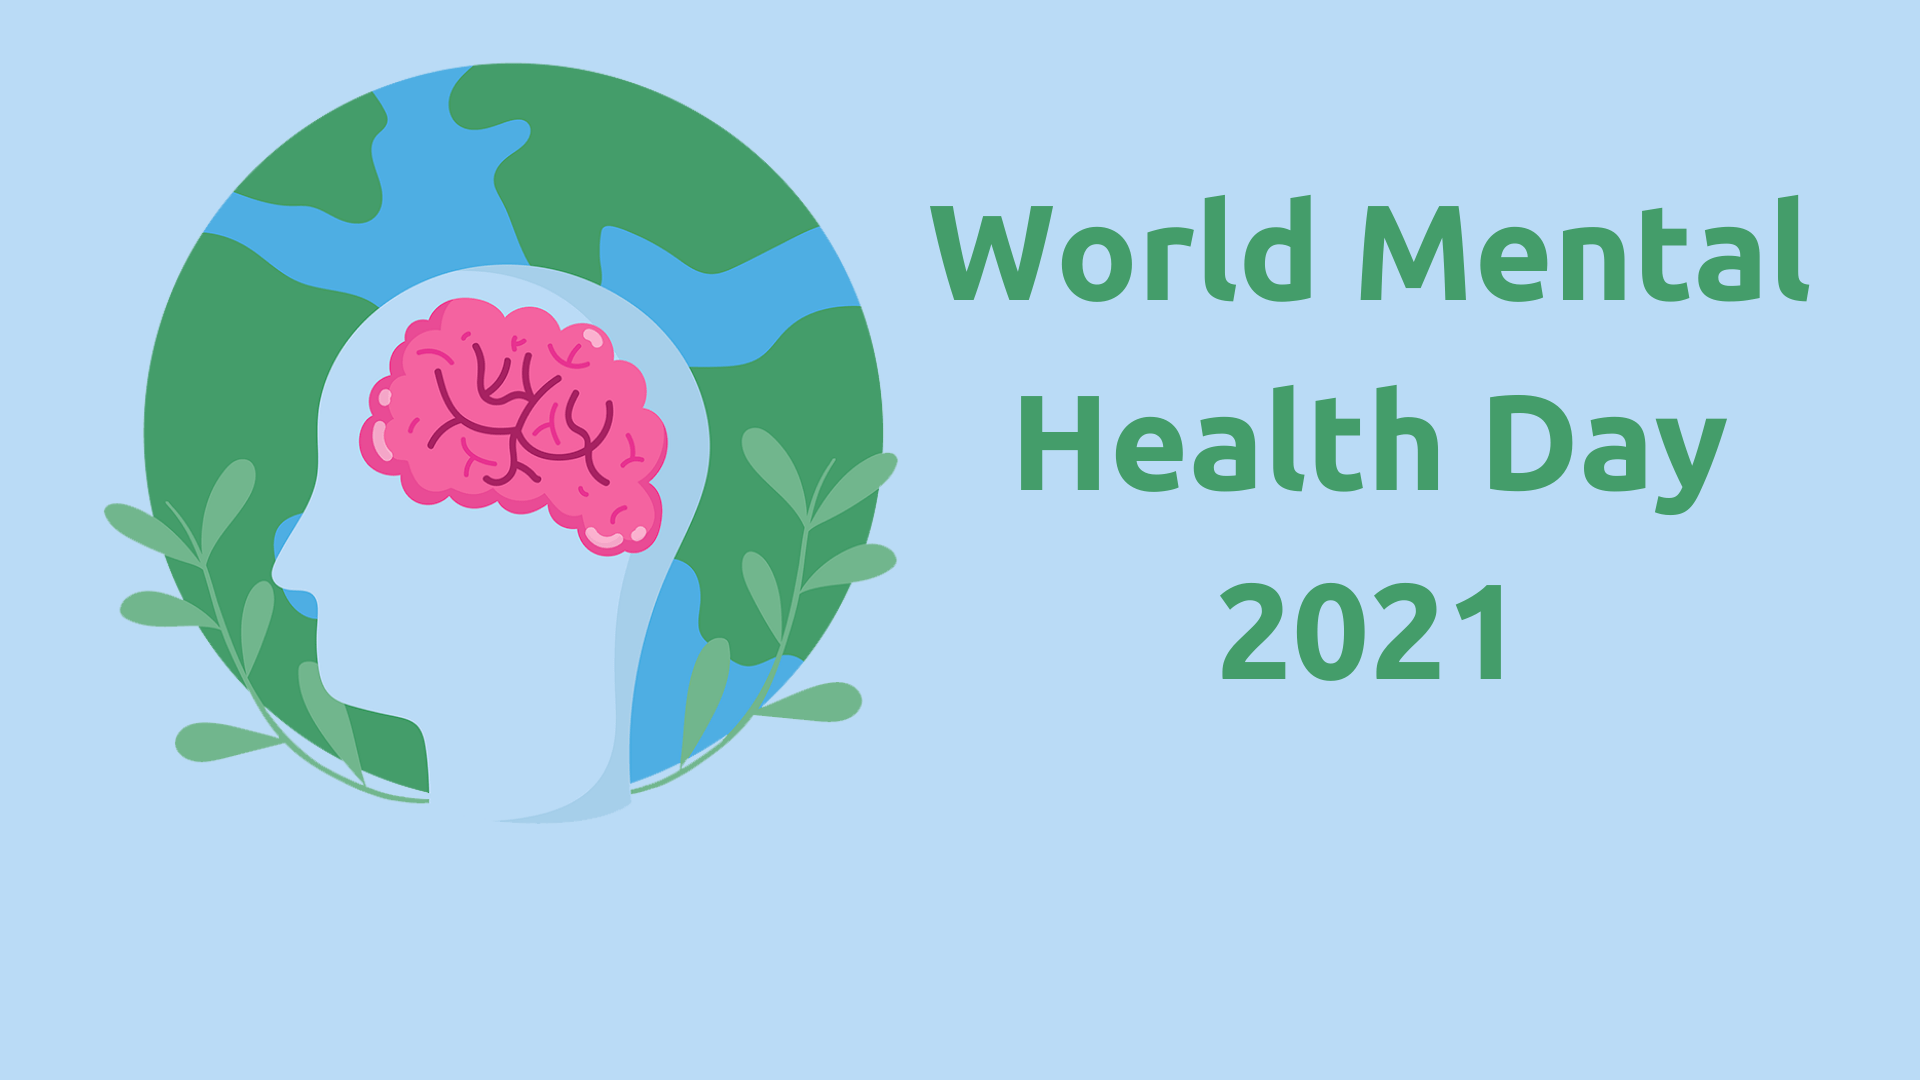 World Mental Health Day 2021 - Early Metrics